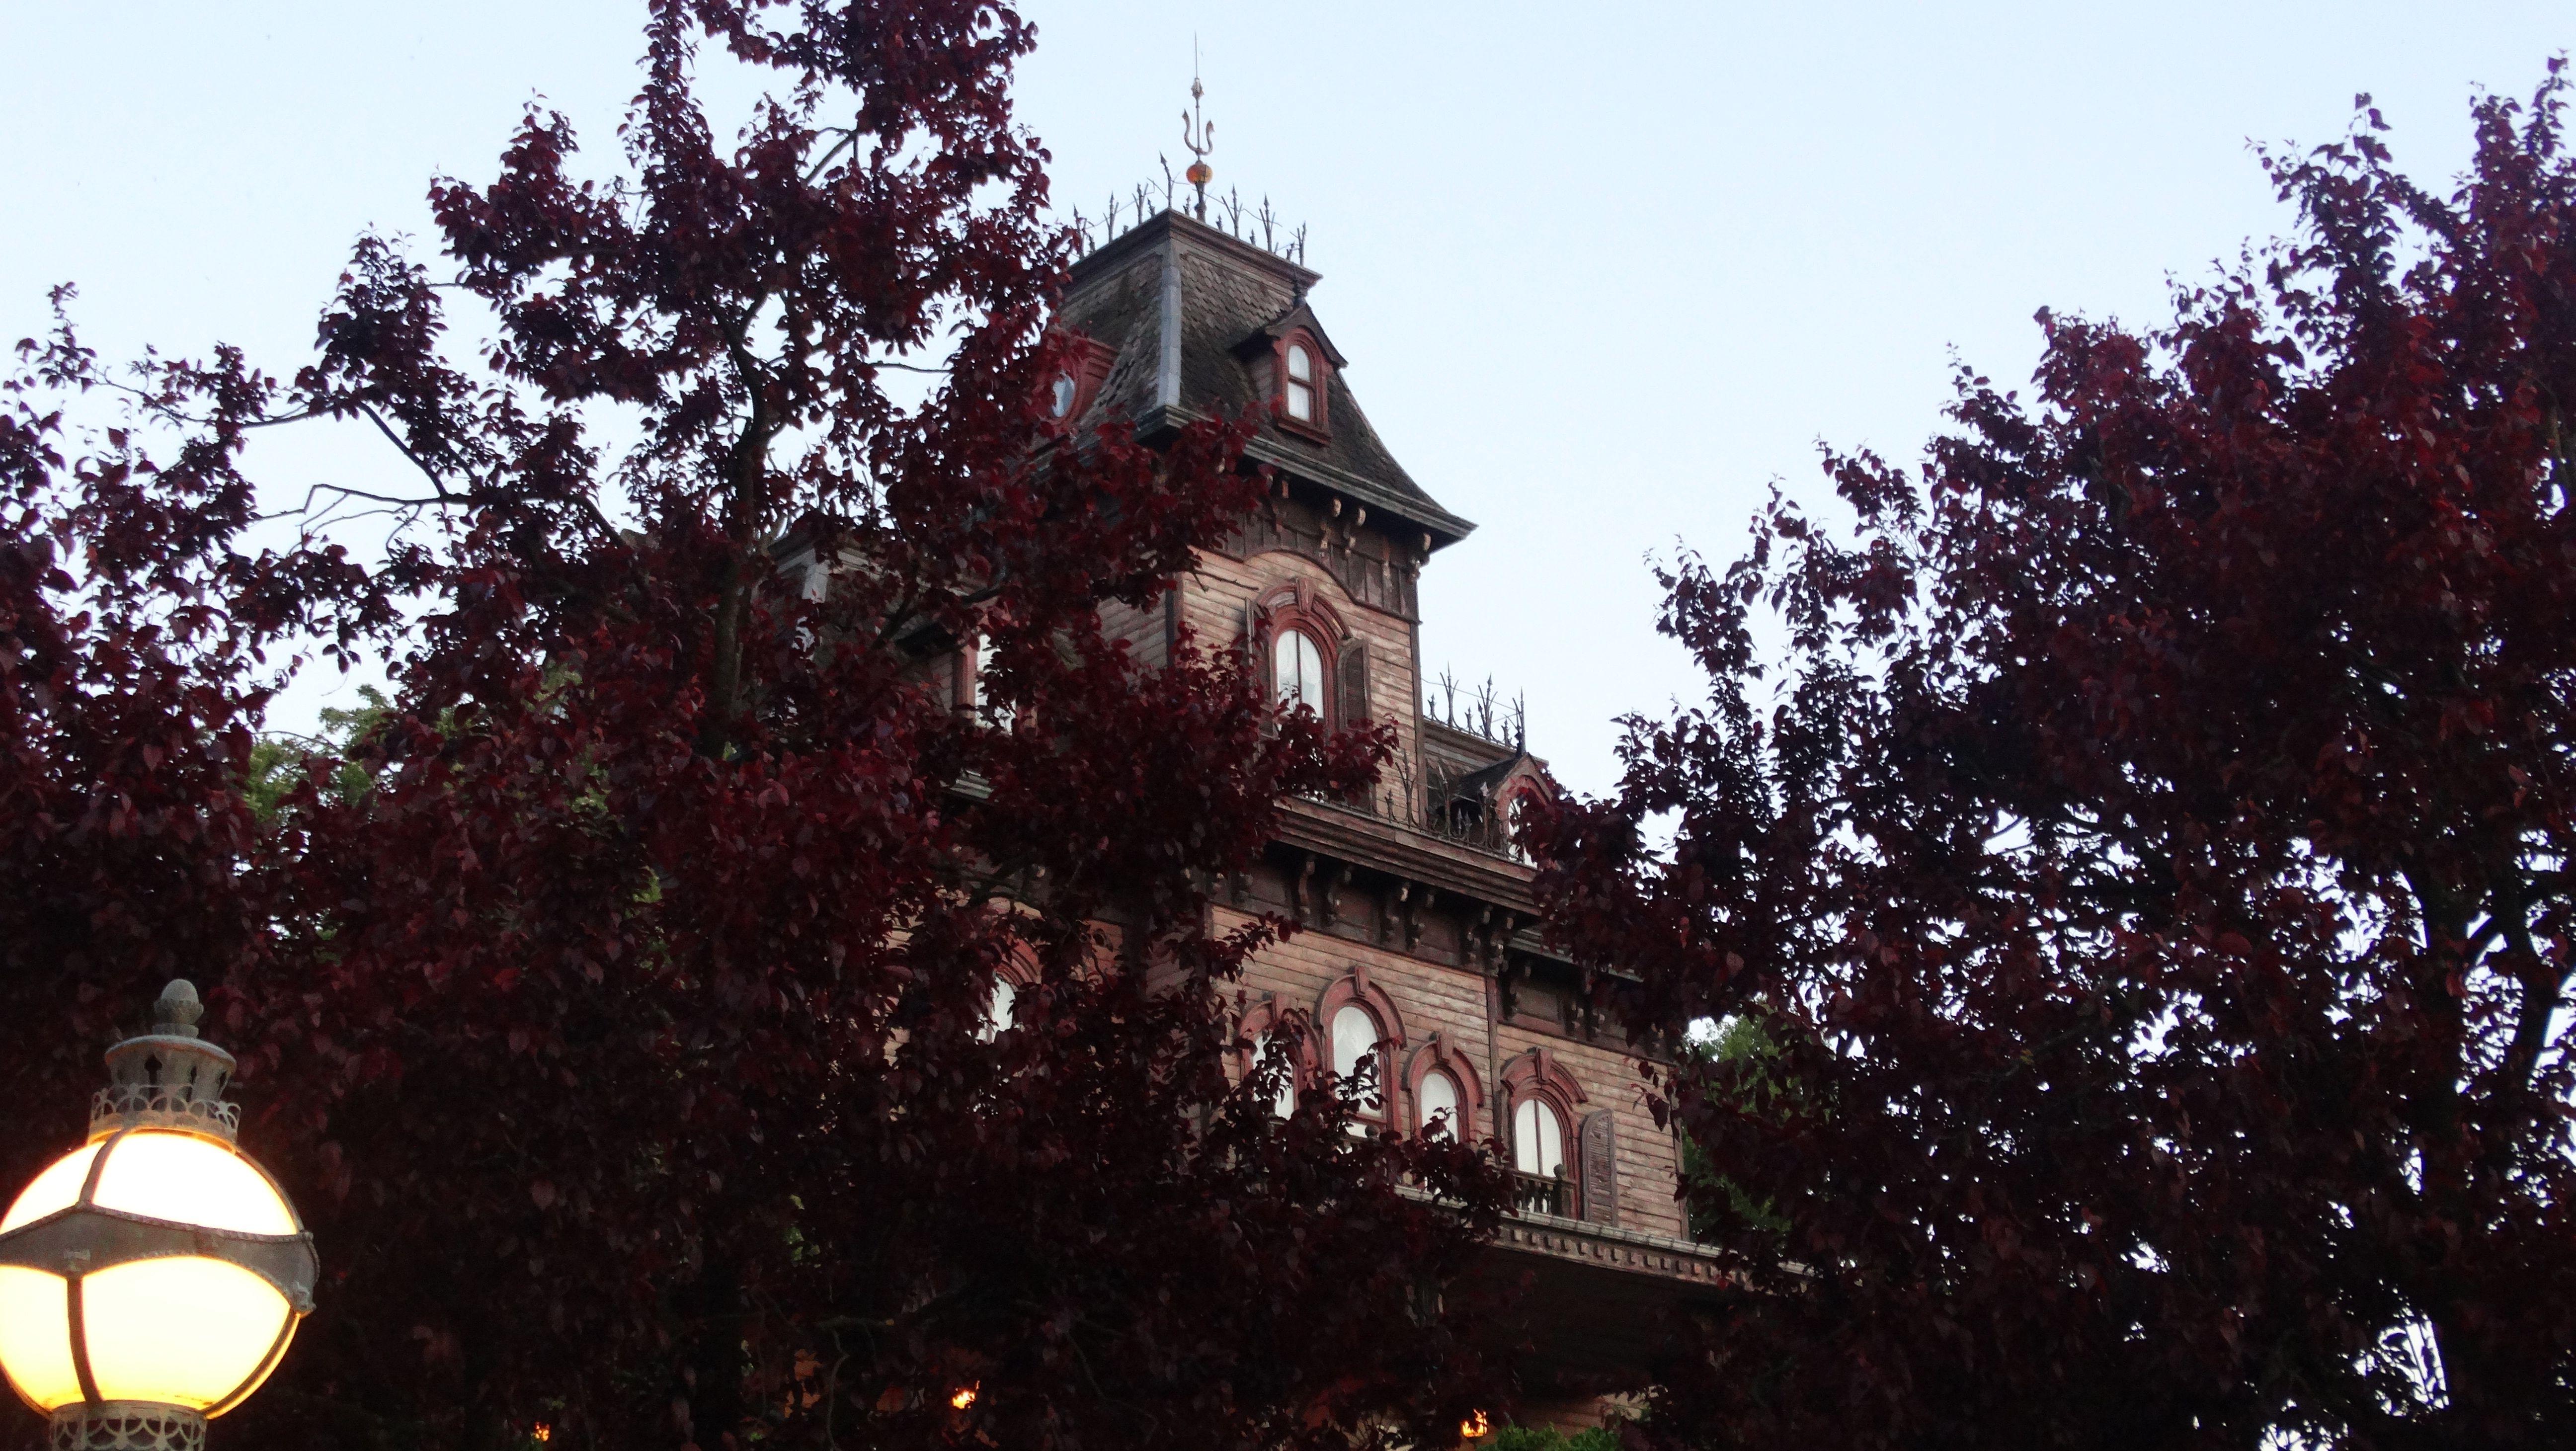 Grand Staircase - Phantom Manor - Disneyland Paris - Phantom